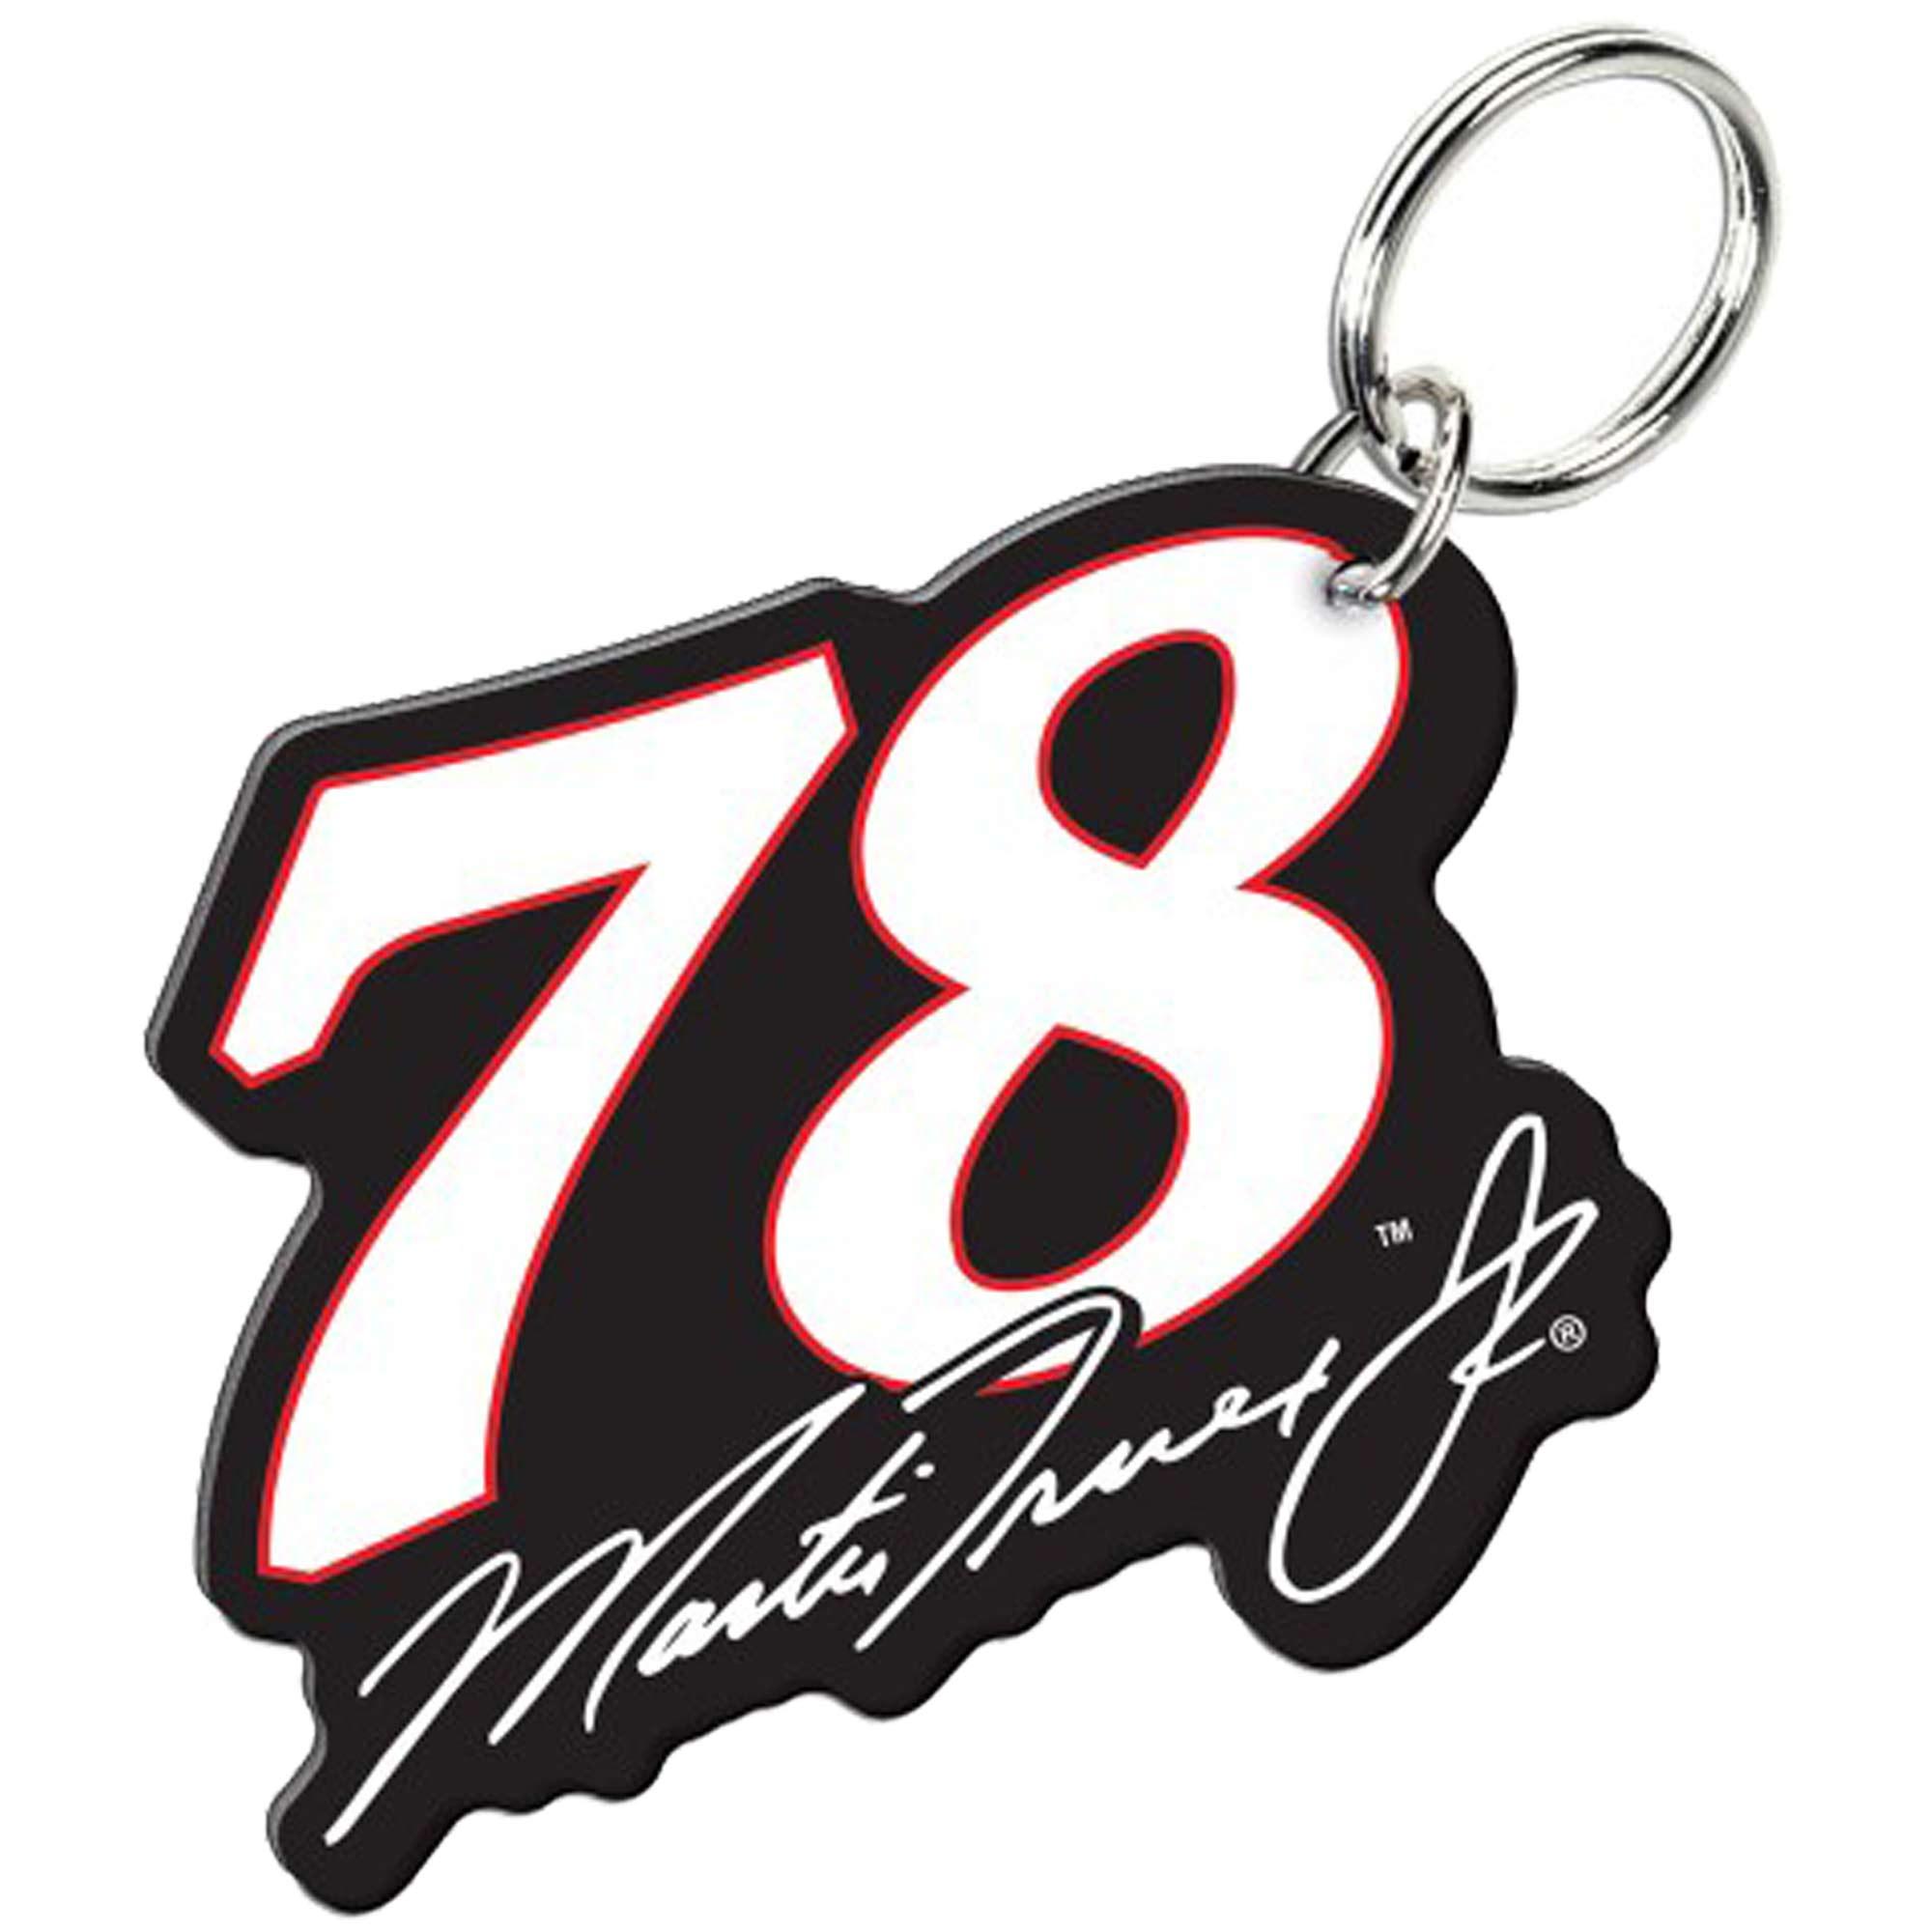 Martin Truex Jr WinCraft Number Premium Acrylic Key Ring - No Size